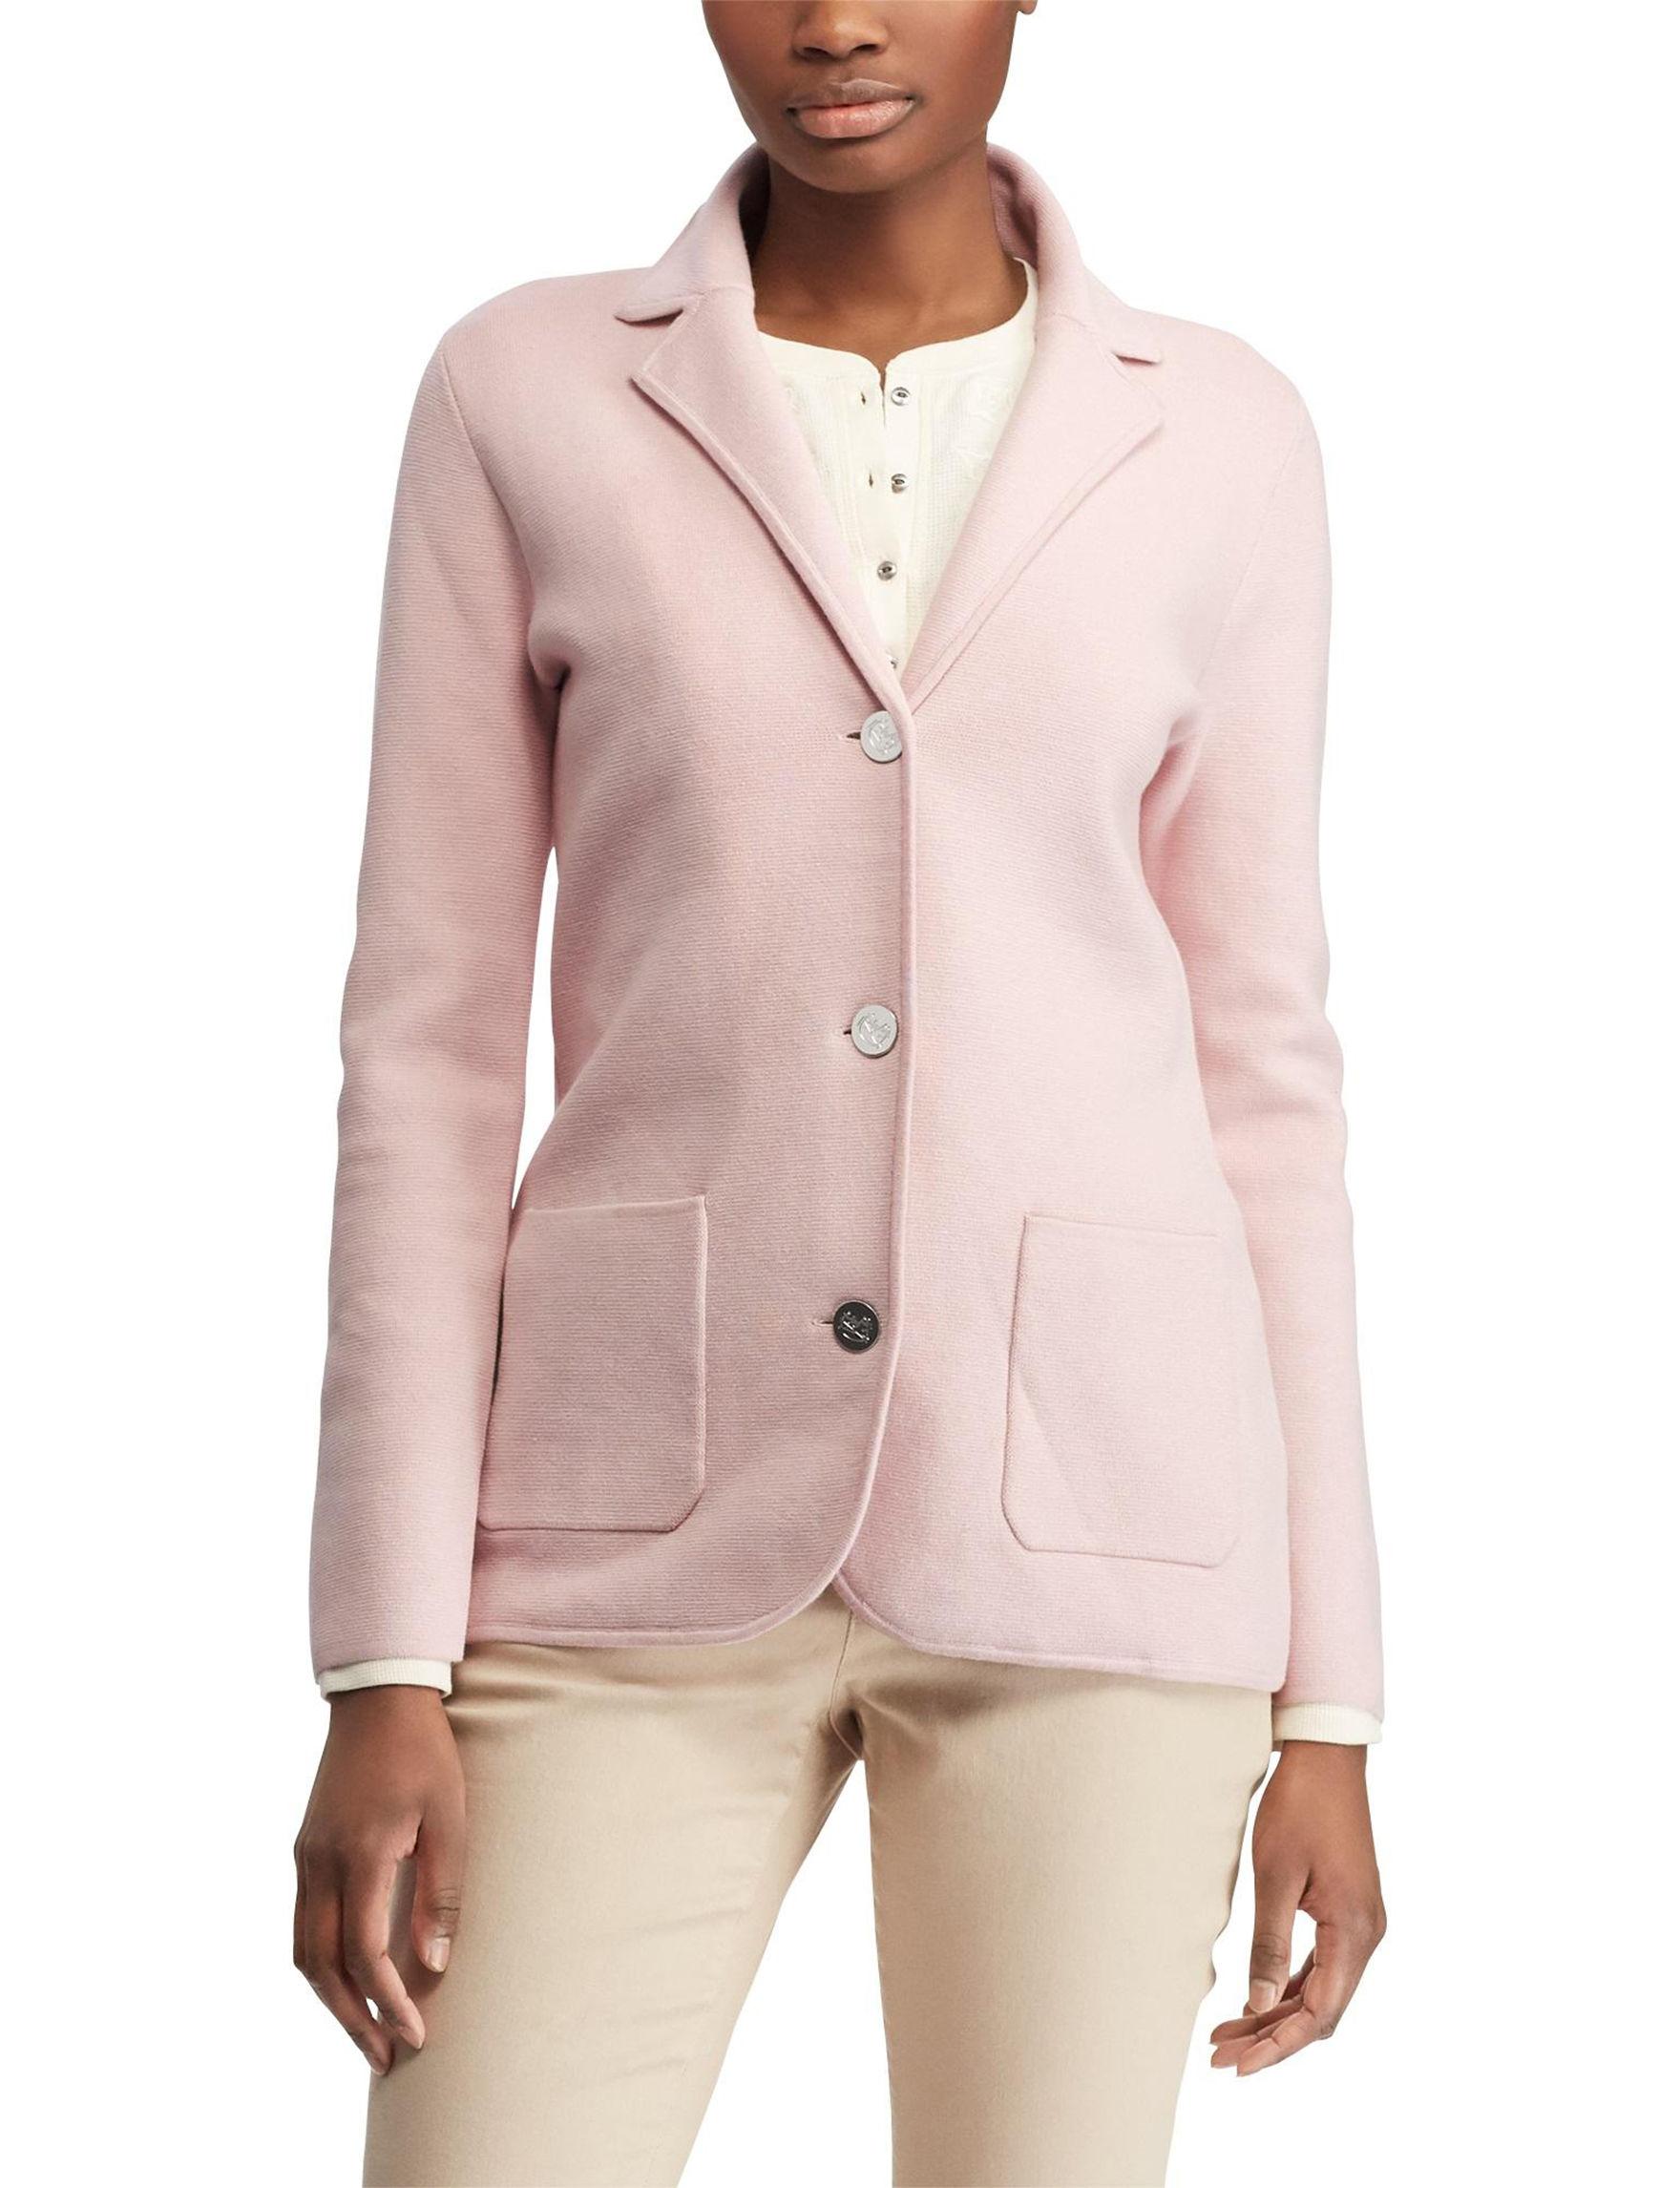 Chaps Pink Lightweight Jackets & Blazers